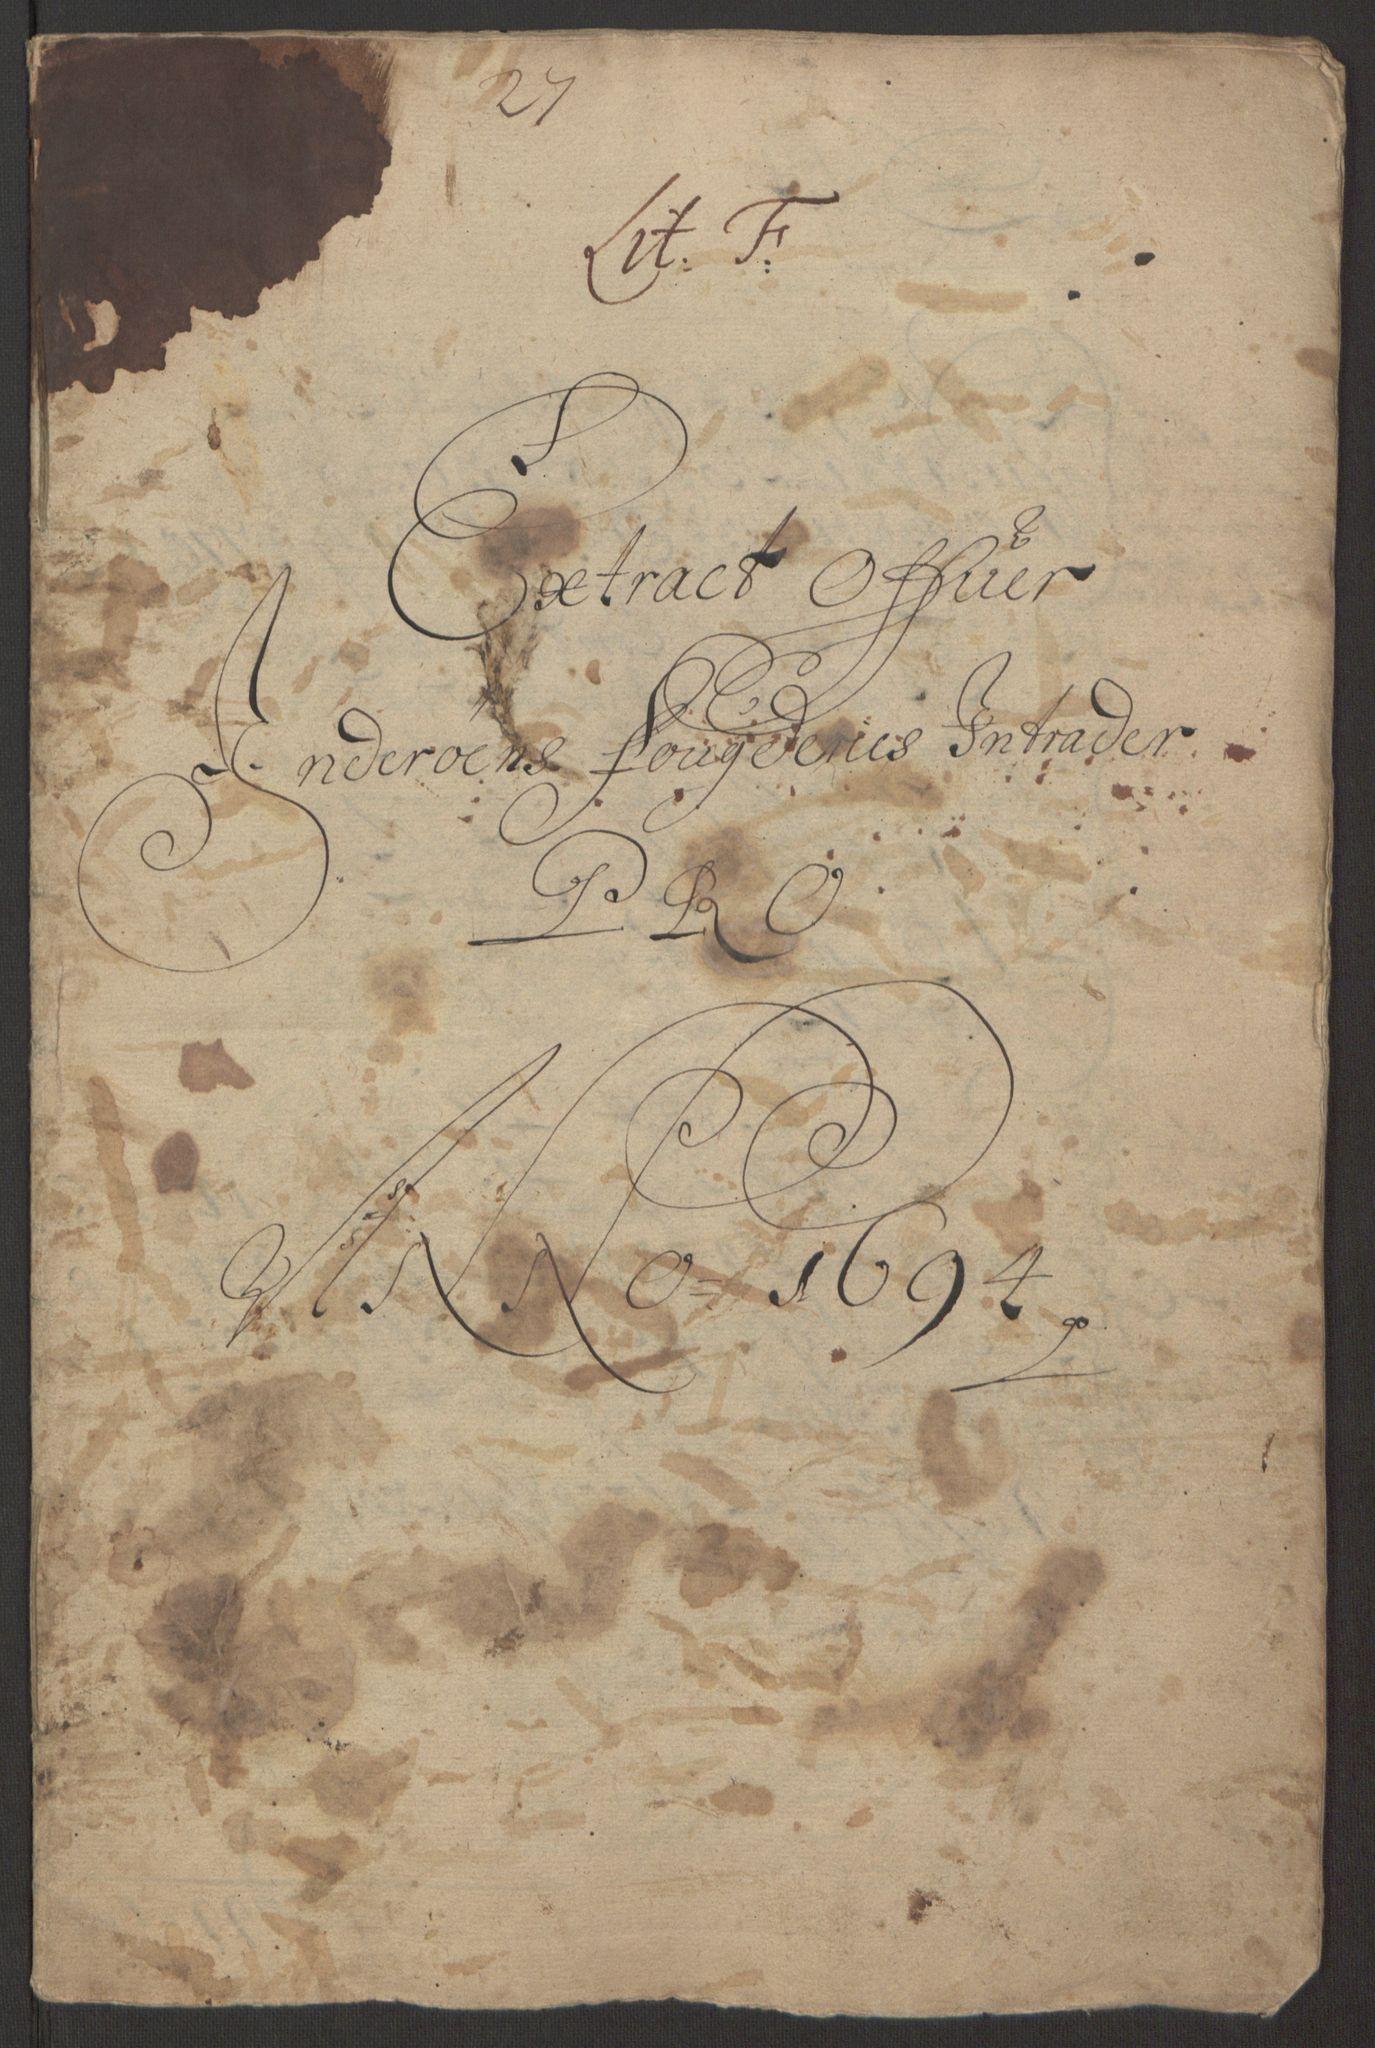 RA, Rentekammeret inntil 1814, Reviderte regnskaper, Fogderegnskap, R63/L4308: Fogderegnskap Inderøy, 1692-1694, s. 523